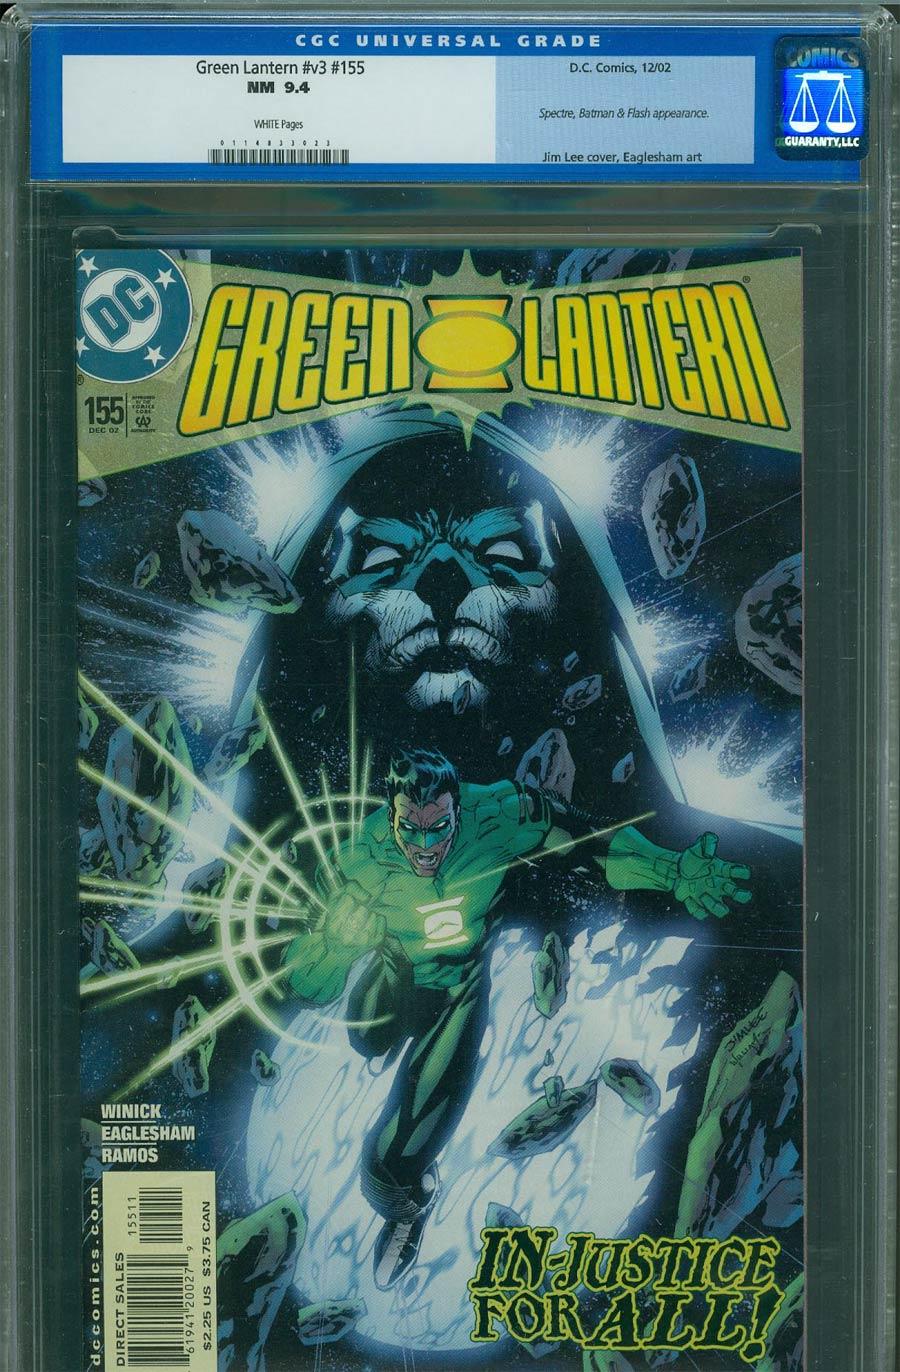 Green Lantern Vol 3 #155 Cover B CGC 9.4